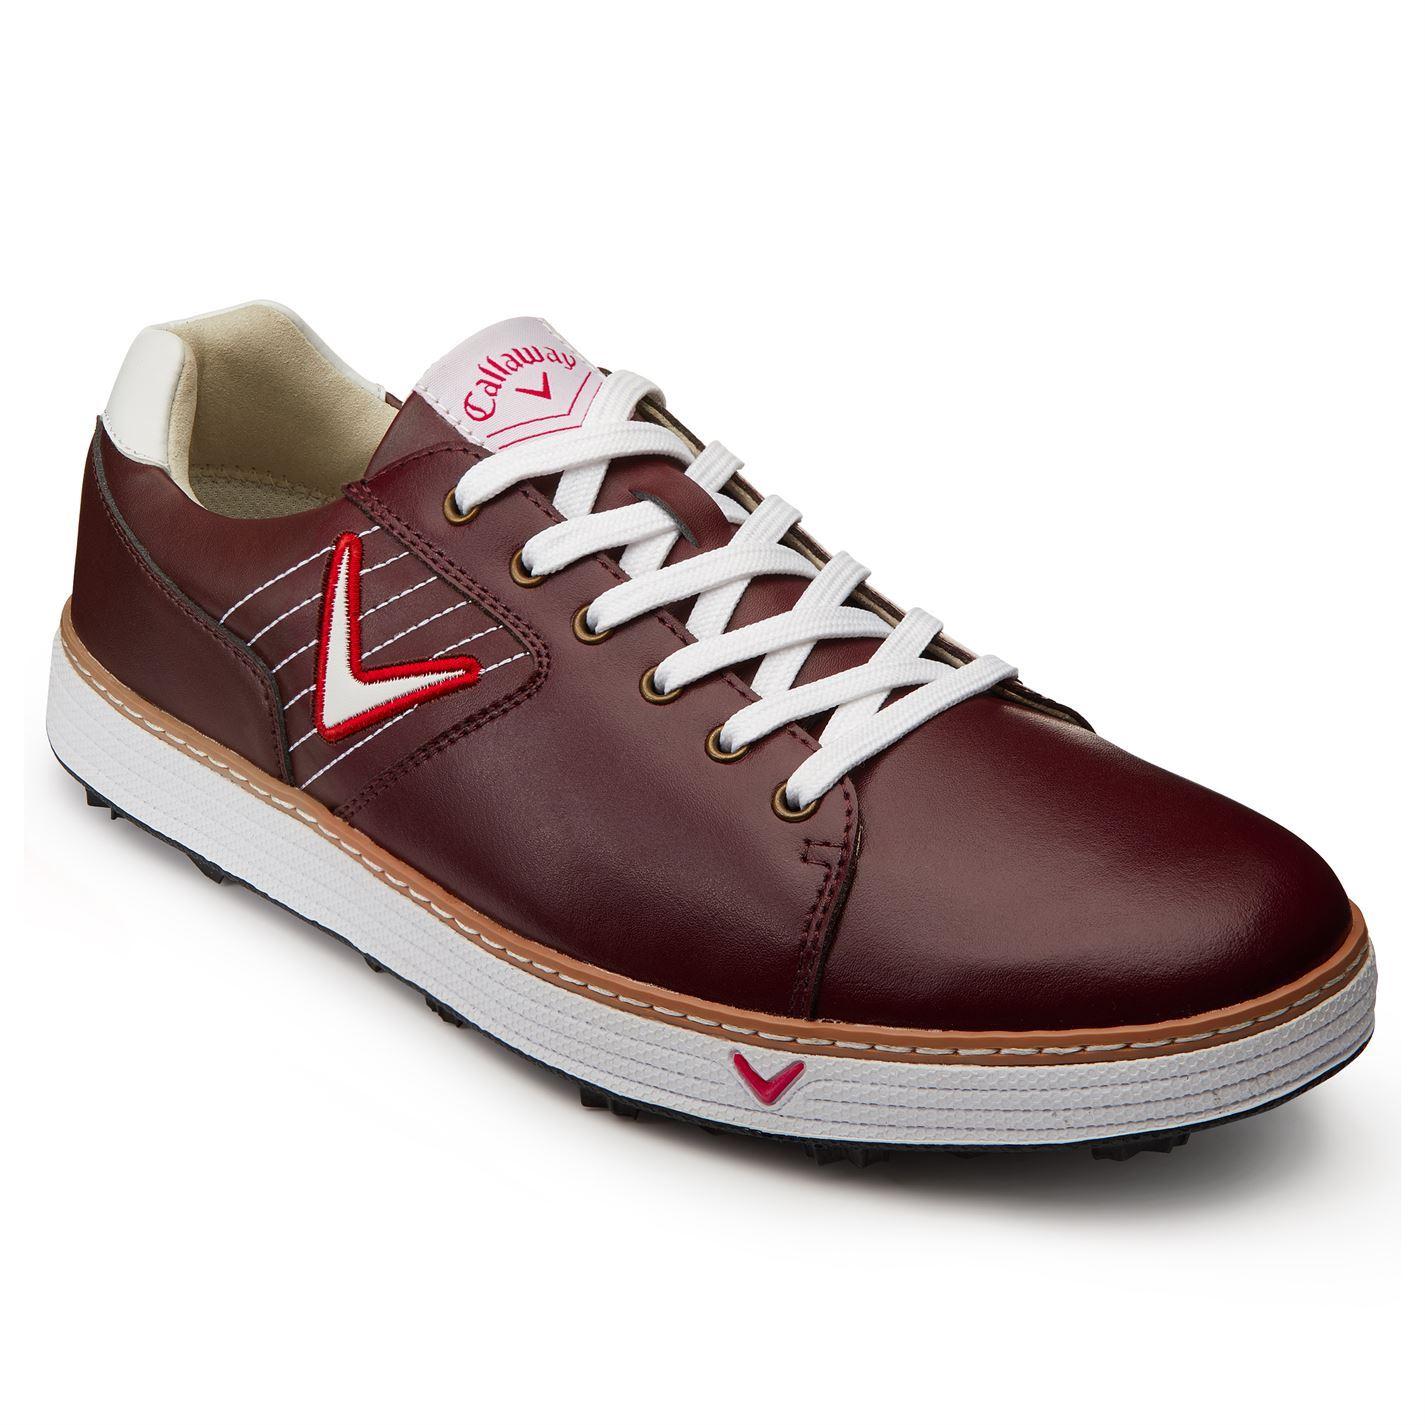 Callaway-Delmar-Urban-Golf-Shoes-Mens-Spikeless-Footwear thumbnail 3